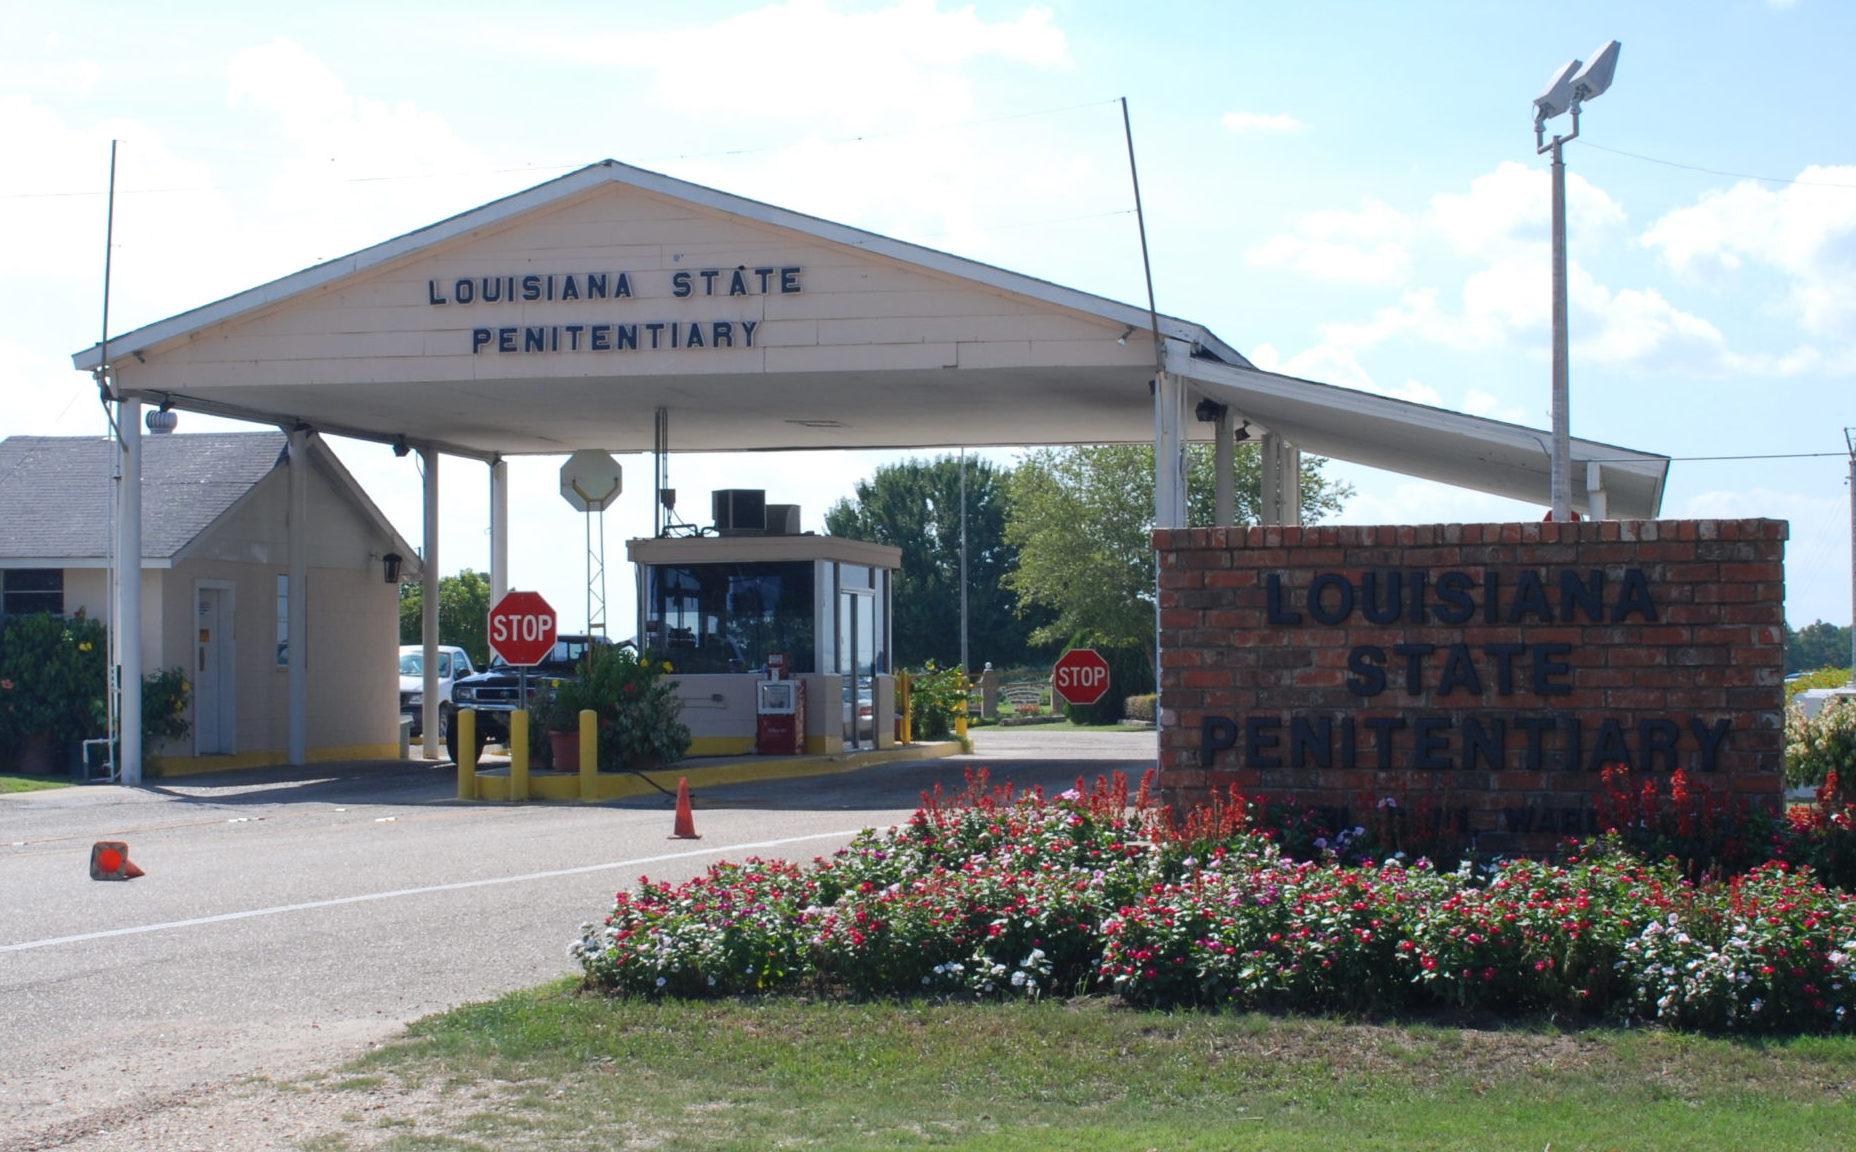 Entrance to Angola Prison